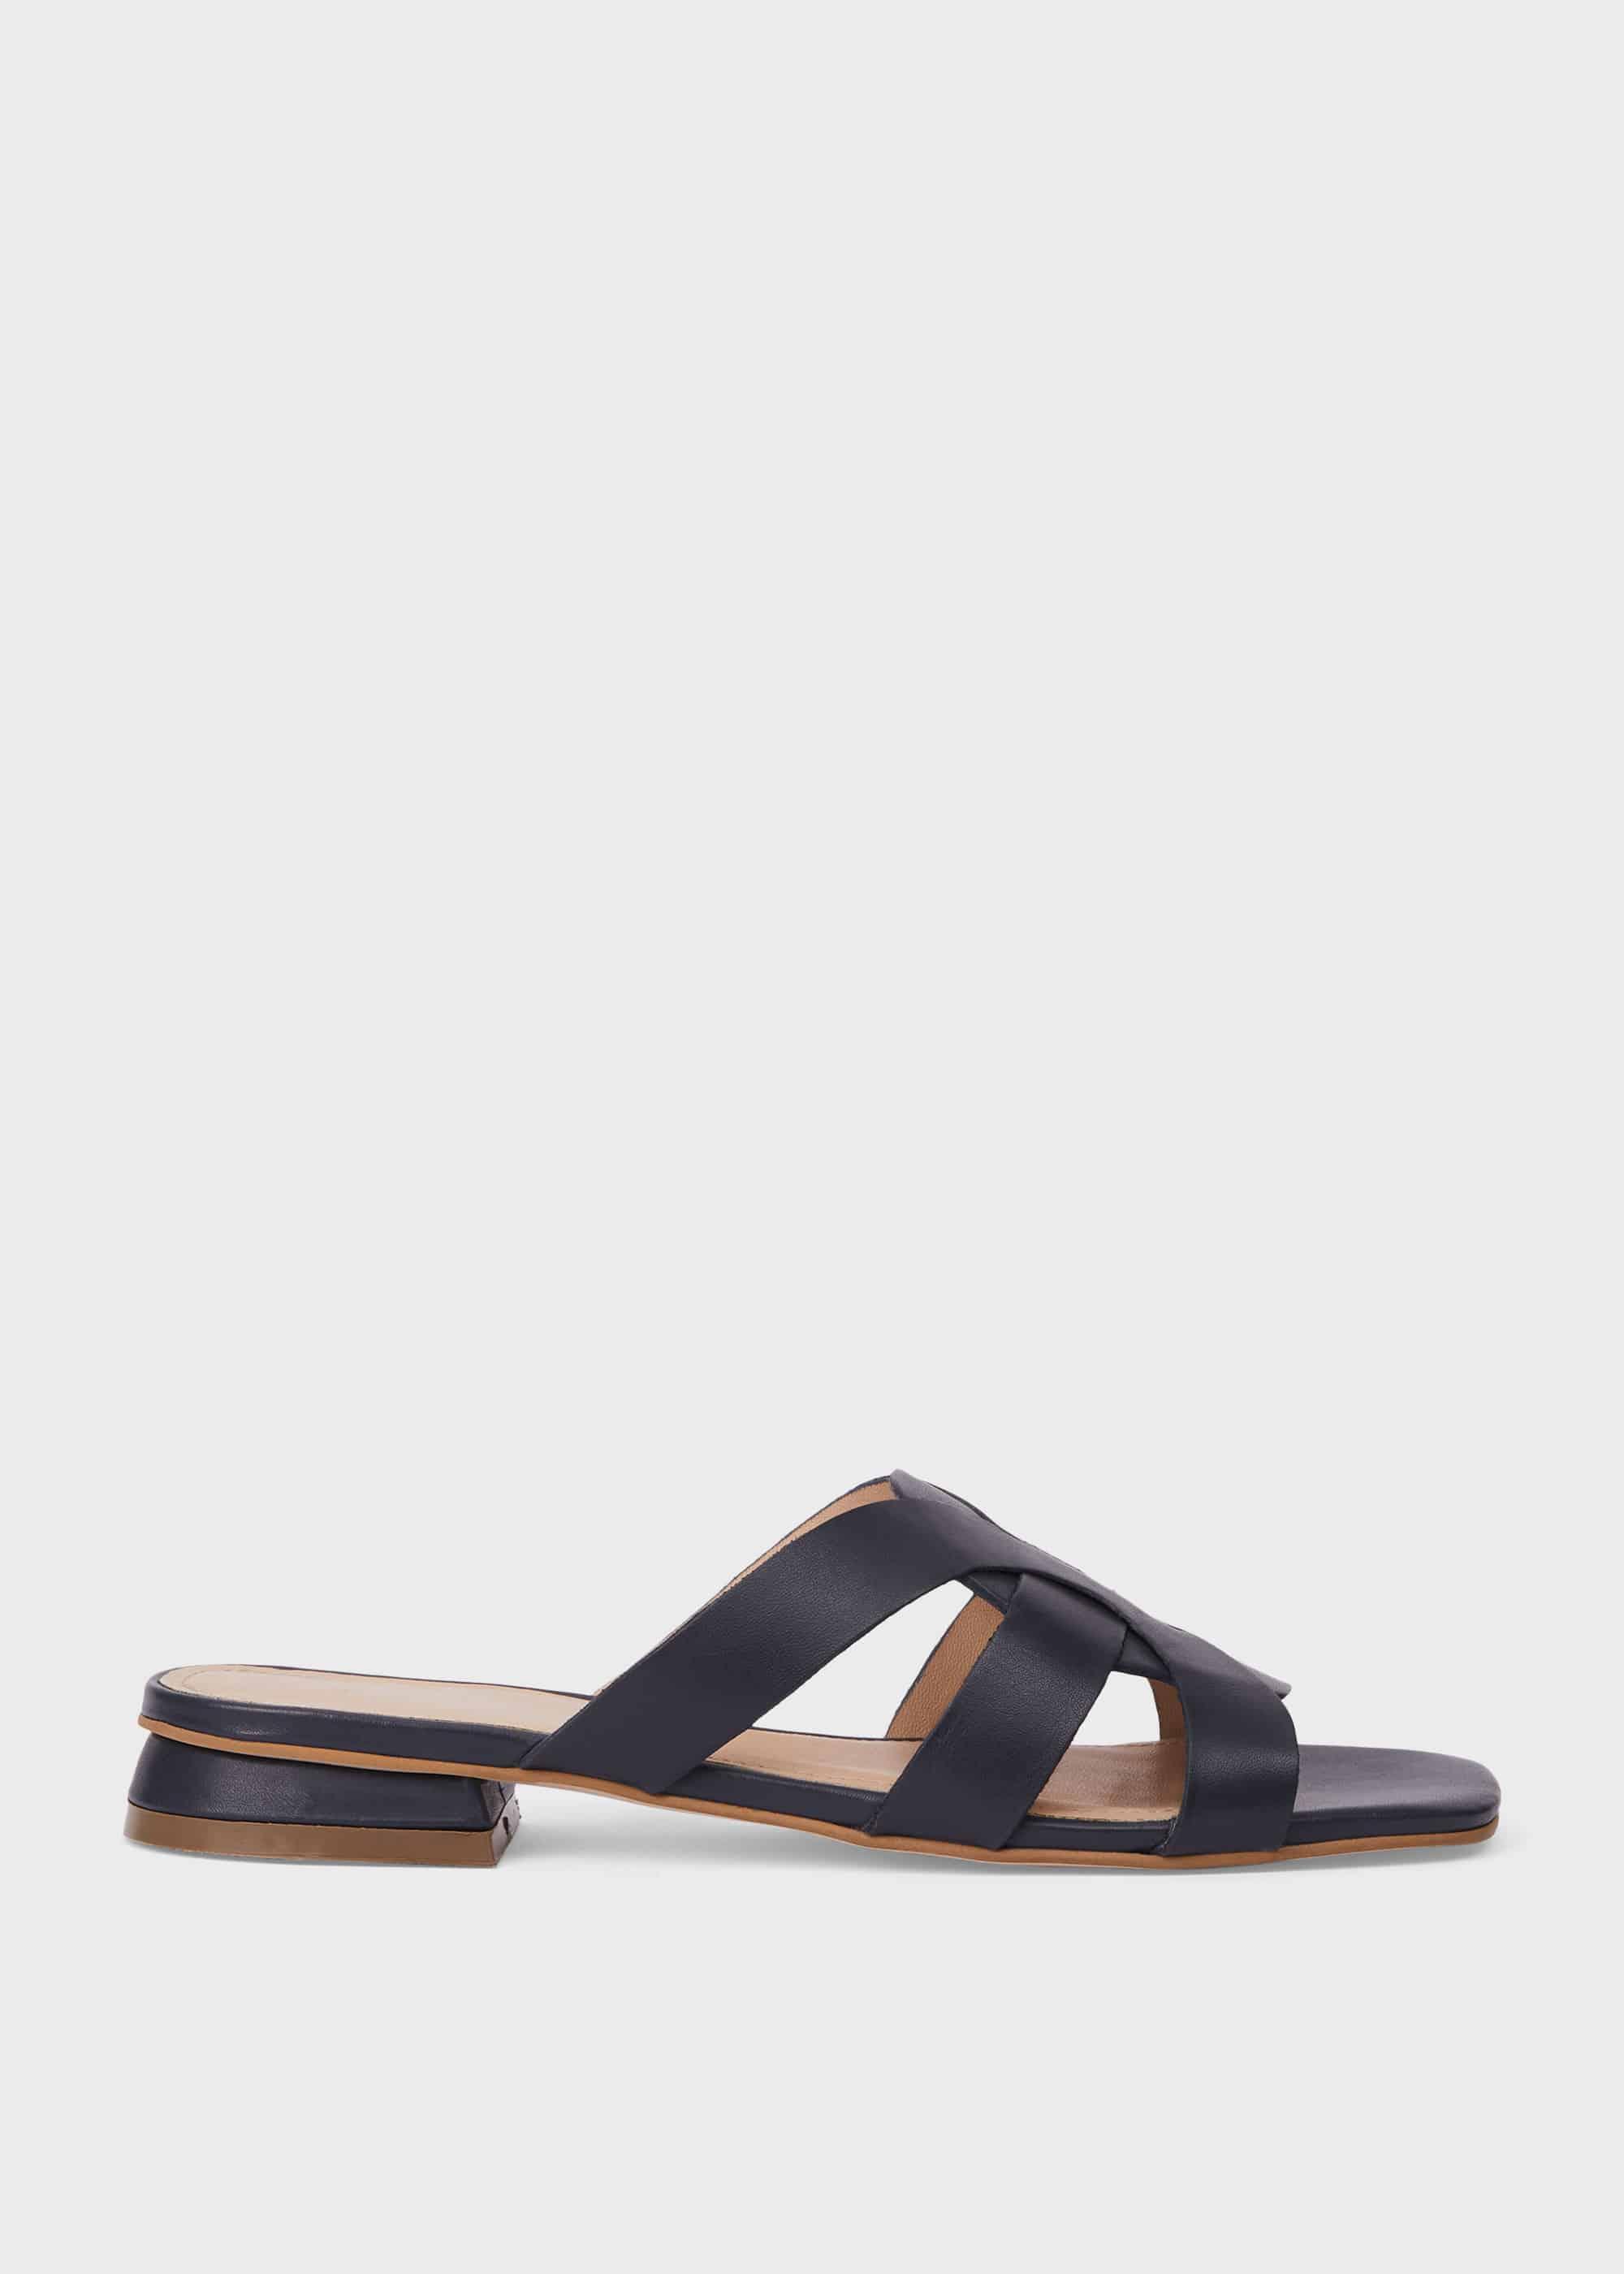 Hobbs Women Alexandra Leather Sandals